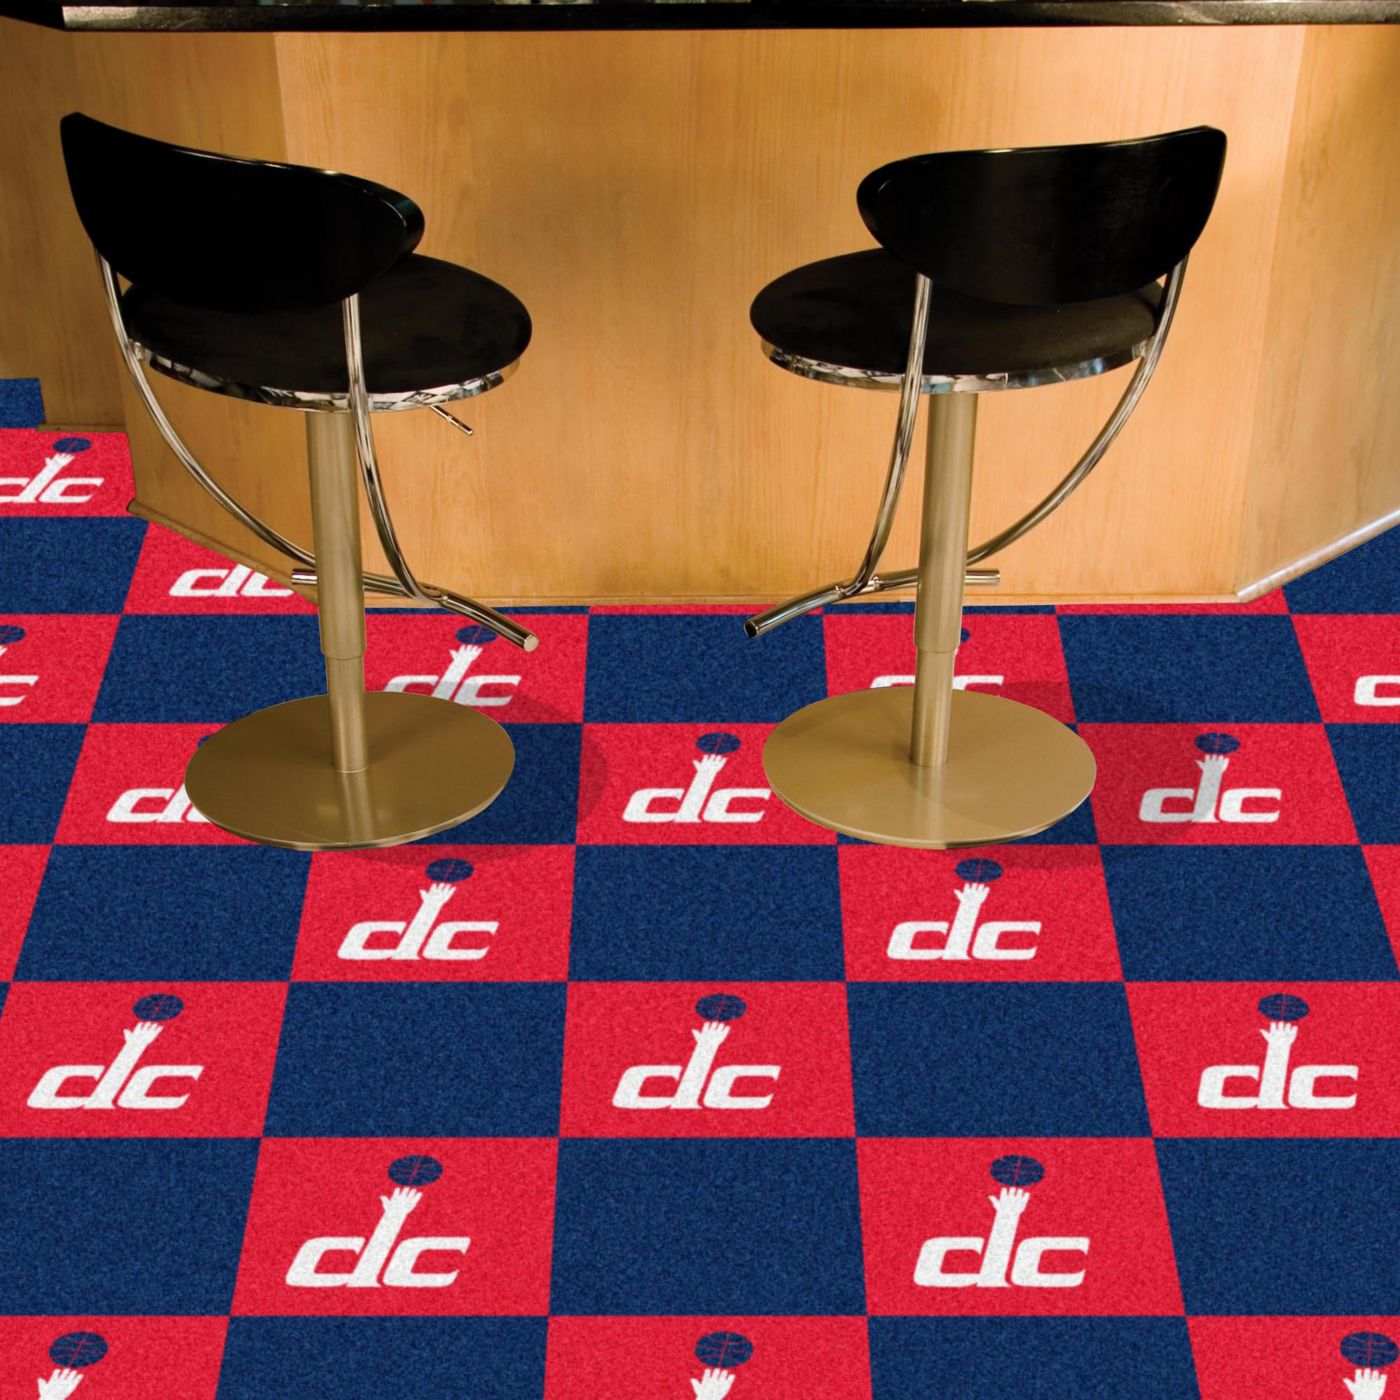 FANMATS Washington Wizards Carpet Tiles